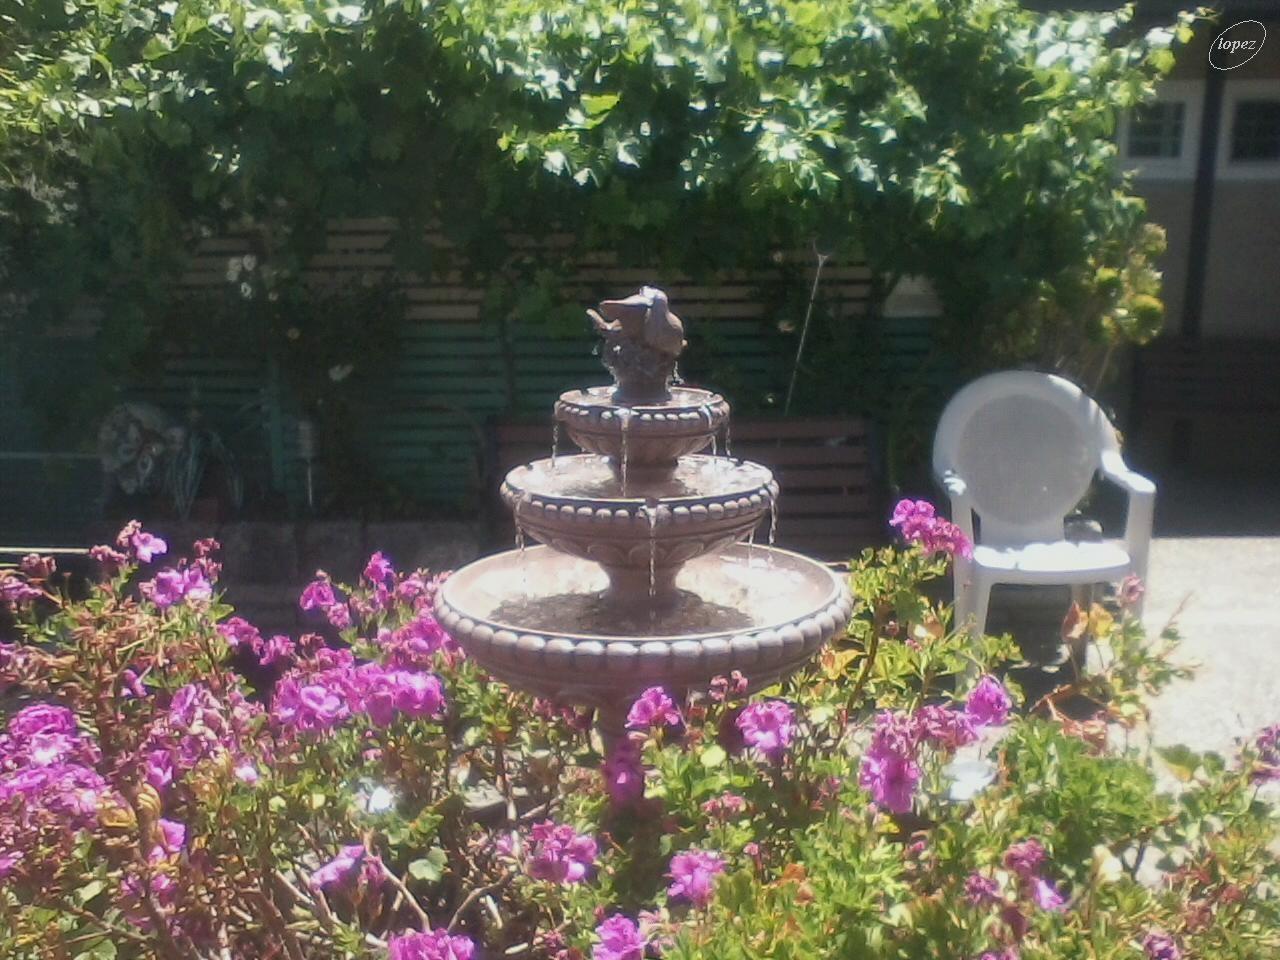 A fountain near a senior home 1 by Francisco Lopez